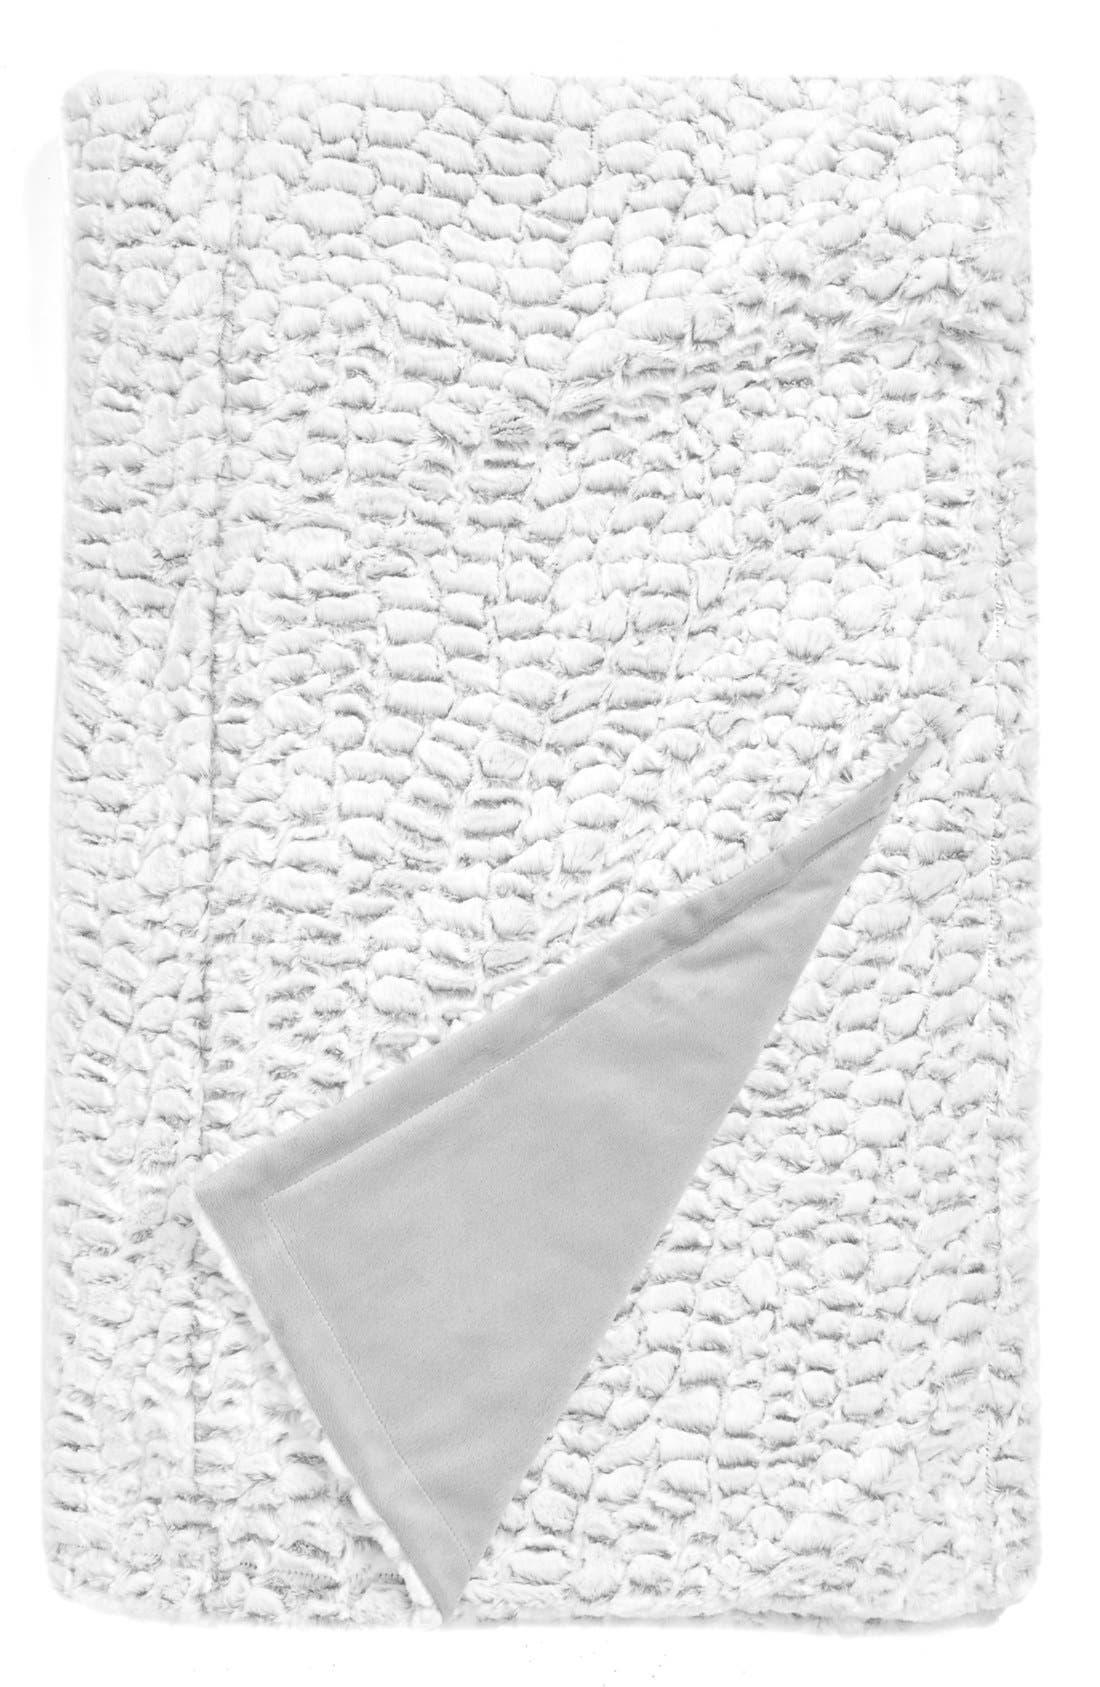 Alternate Image 1 Selected - Nordstrom at Home 'Frosted Petal' Plush Blanket